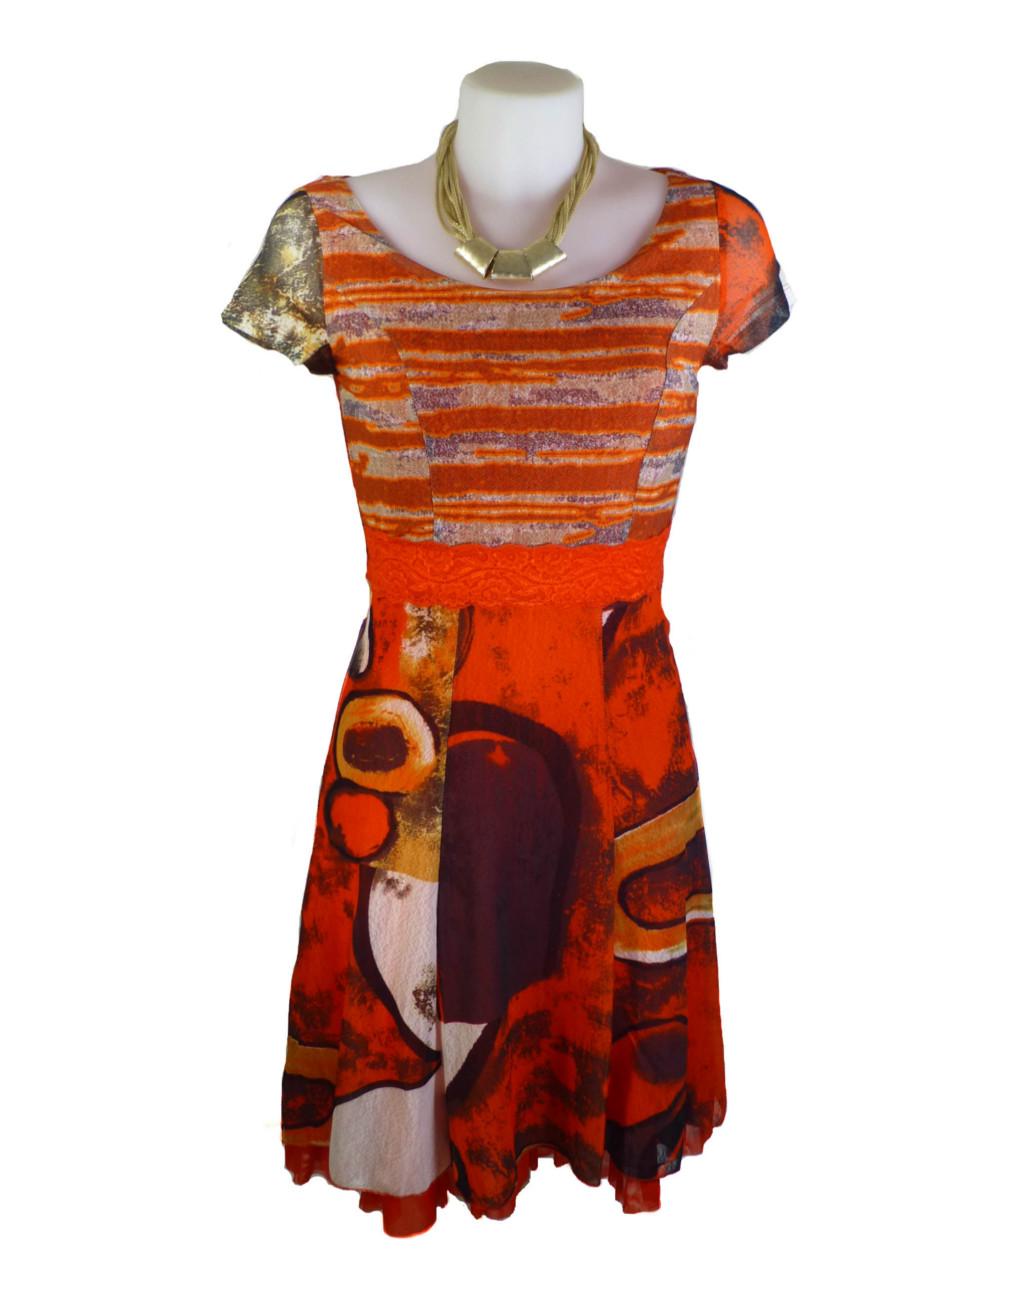 lulu h french style orange dress fashion fix online